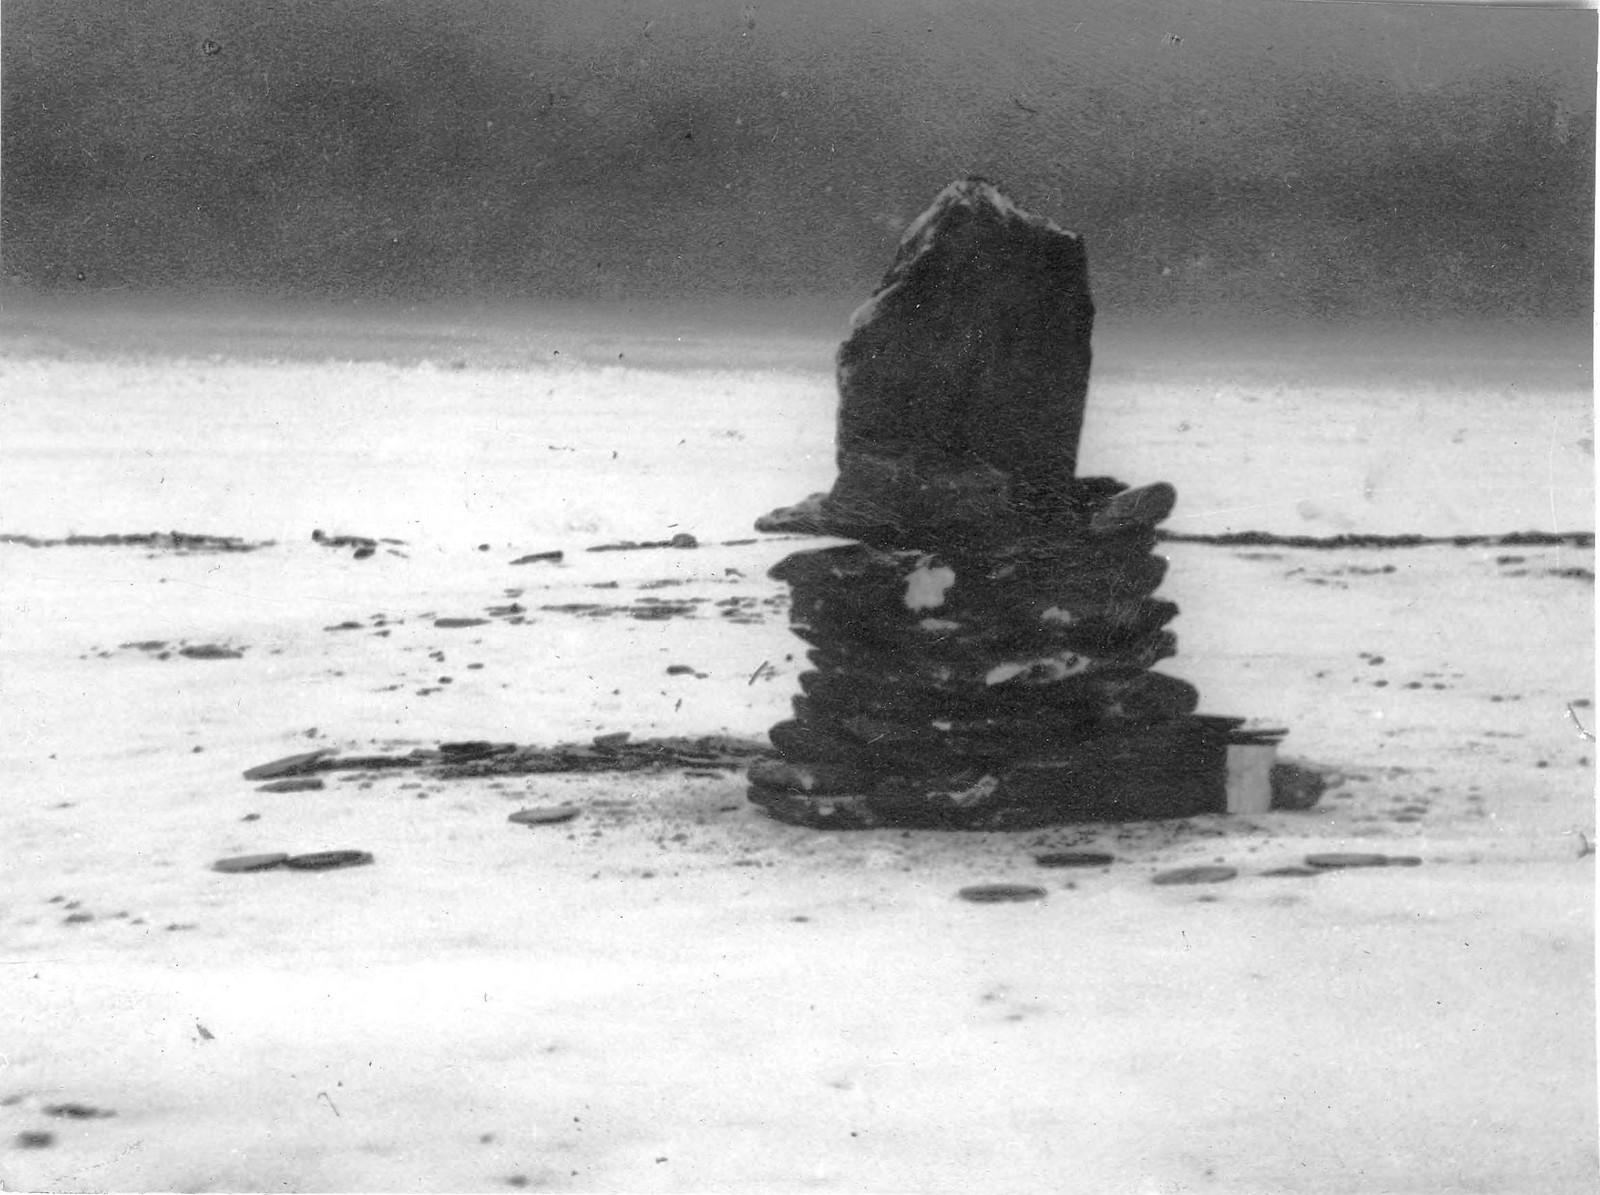 Астрономический пункт на мысе Неупокоева